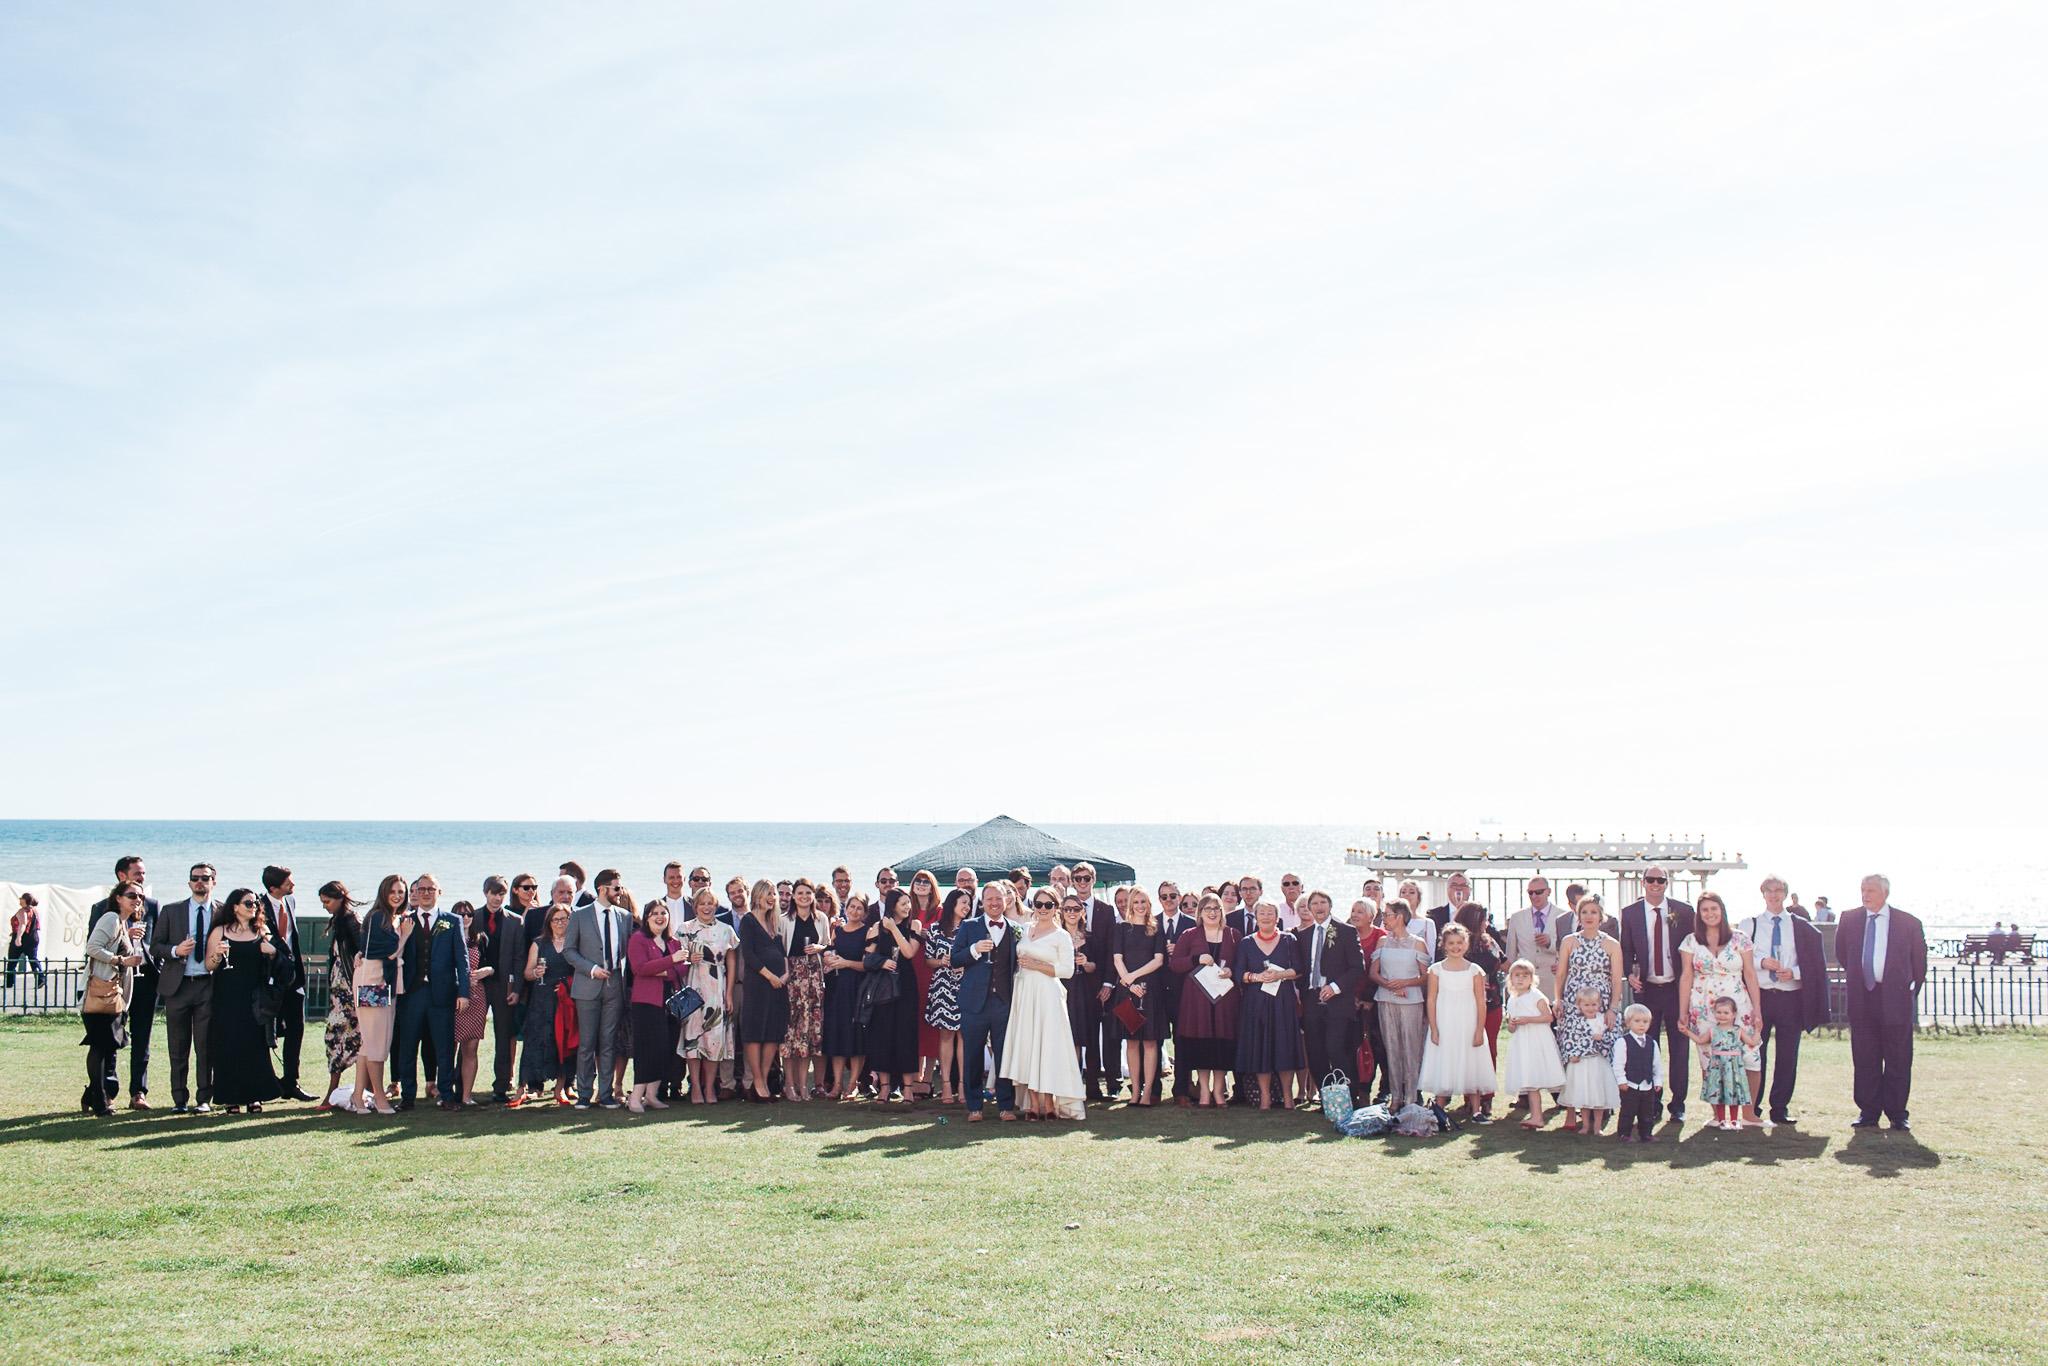 st_andrews_fabrica_brighton_wedding_583.jpg